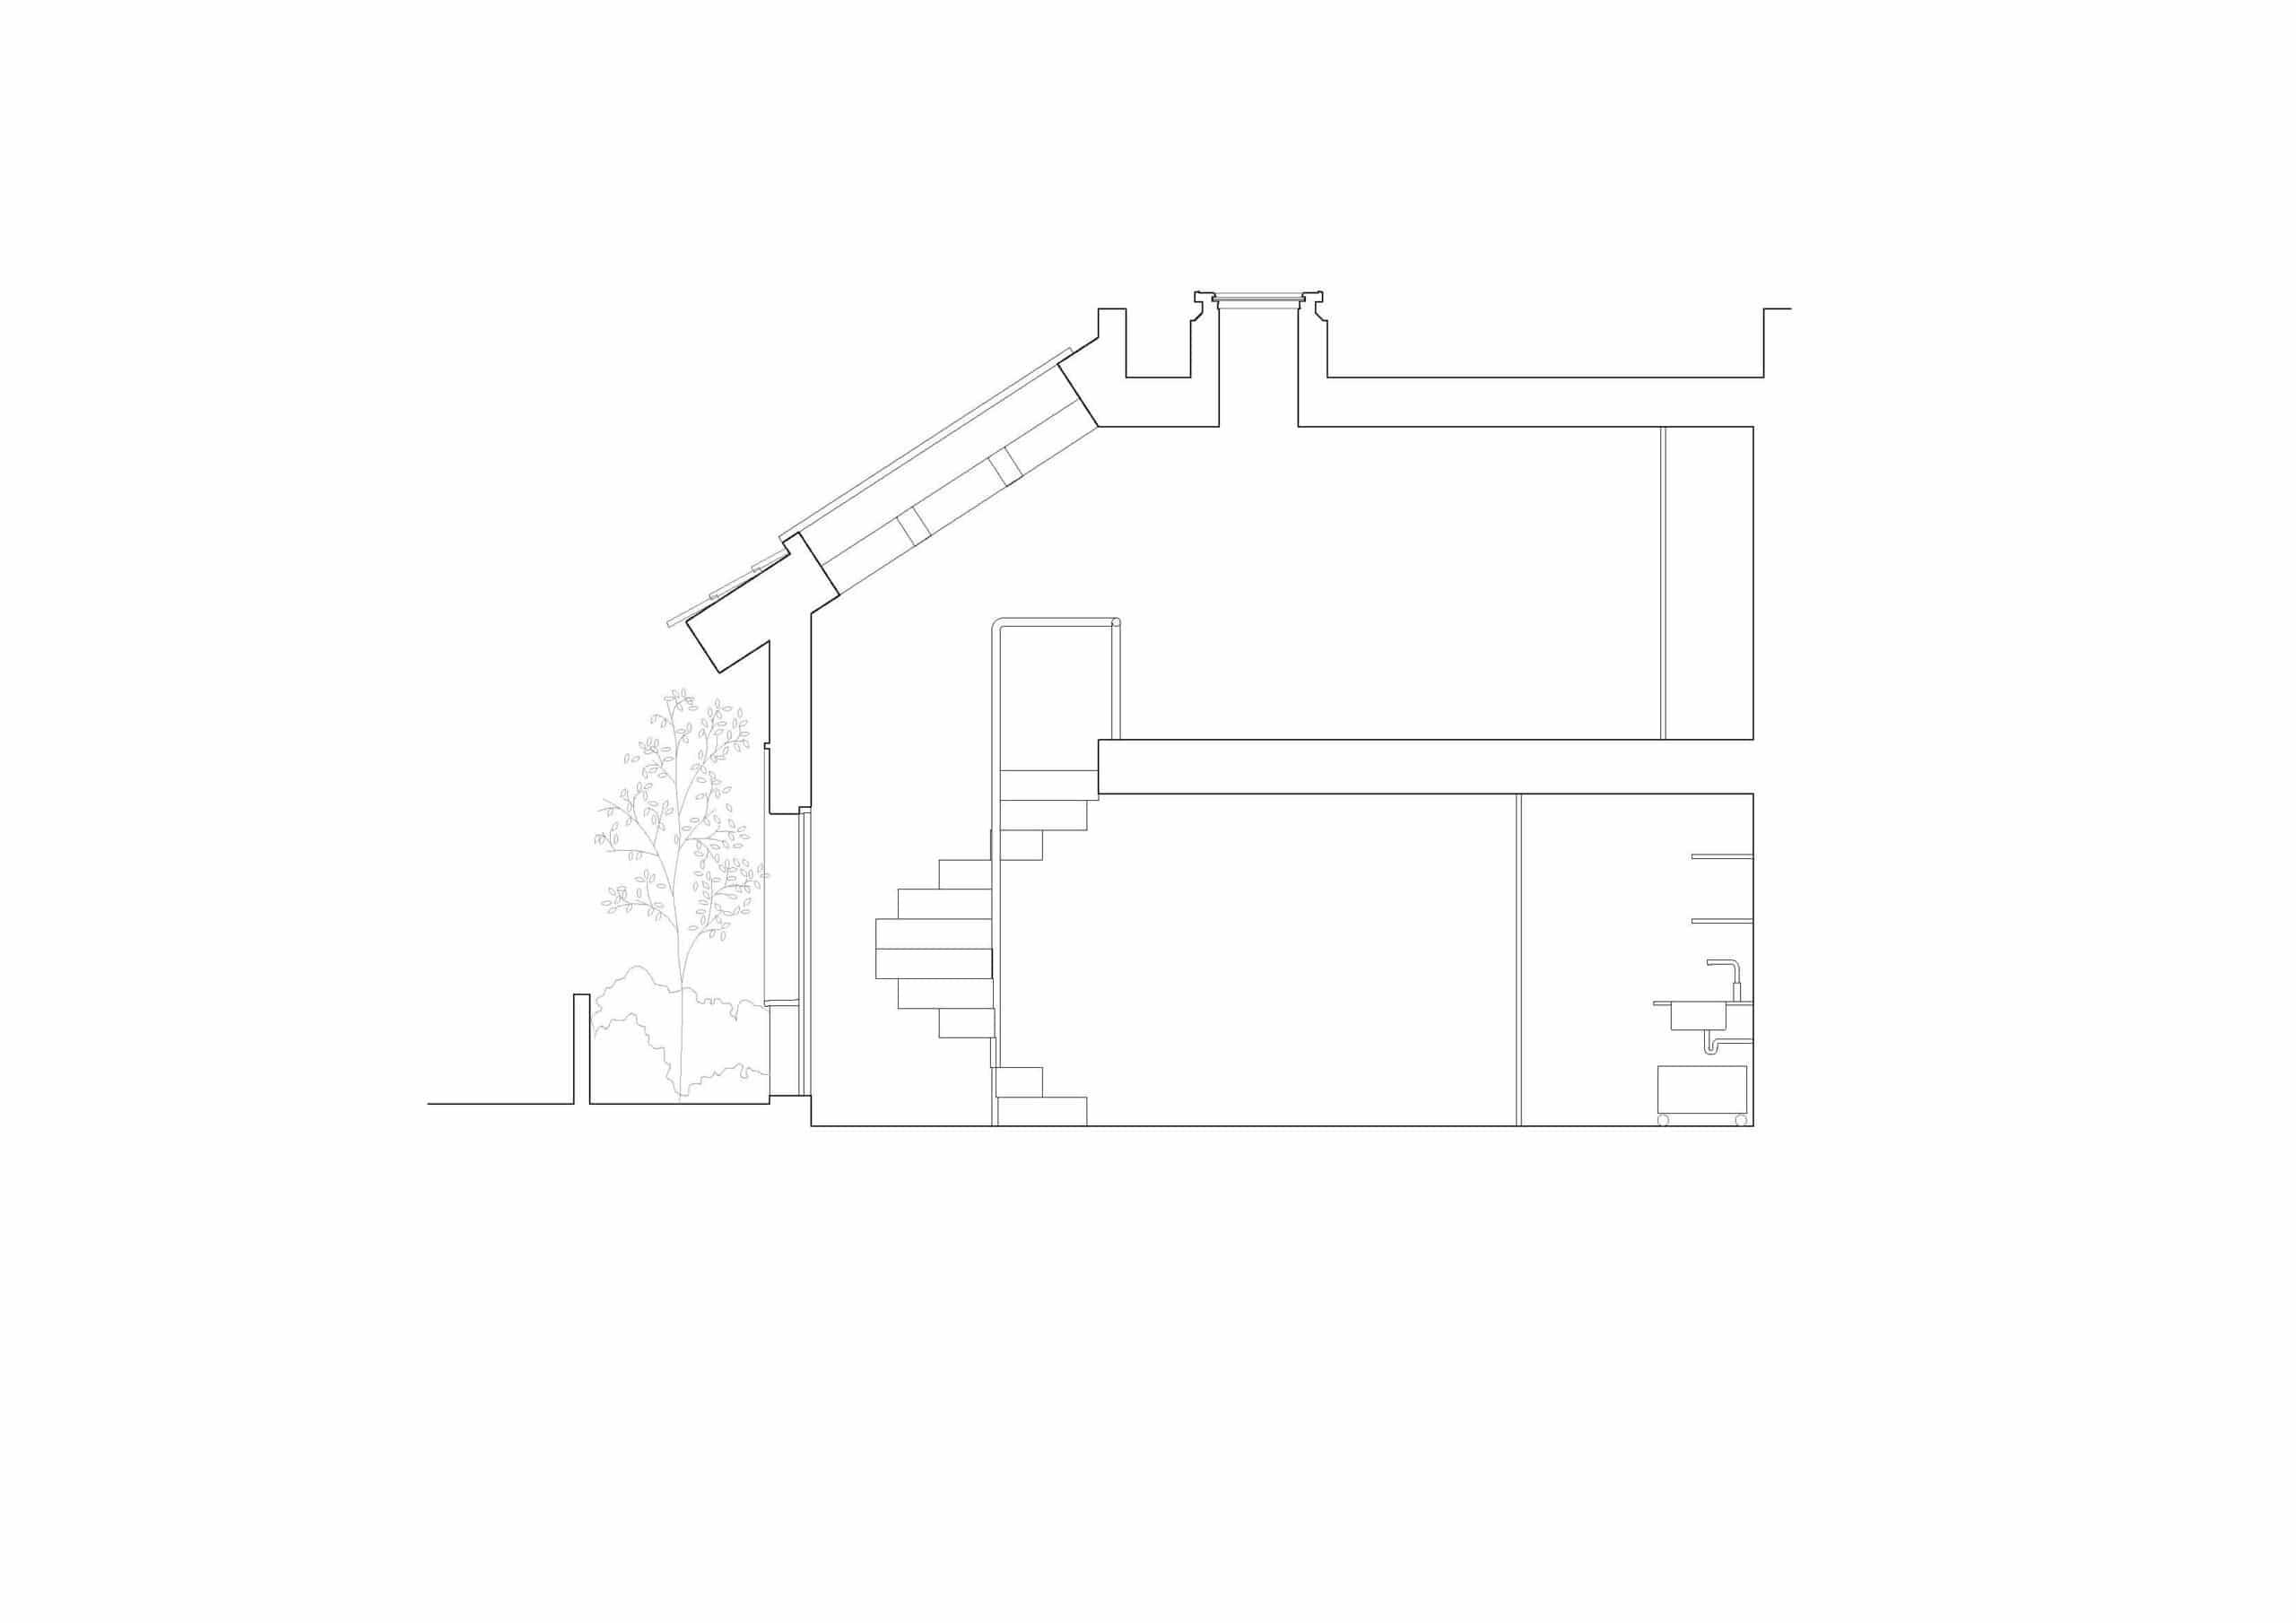 Casa Omar  - 05.2 ArquitecturaG CasaOmar scaled 49